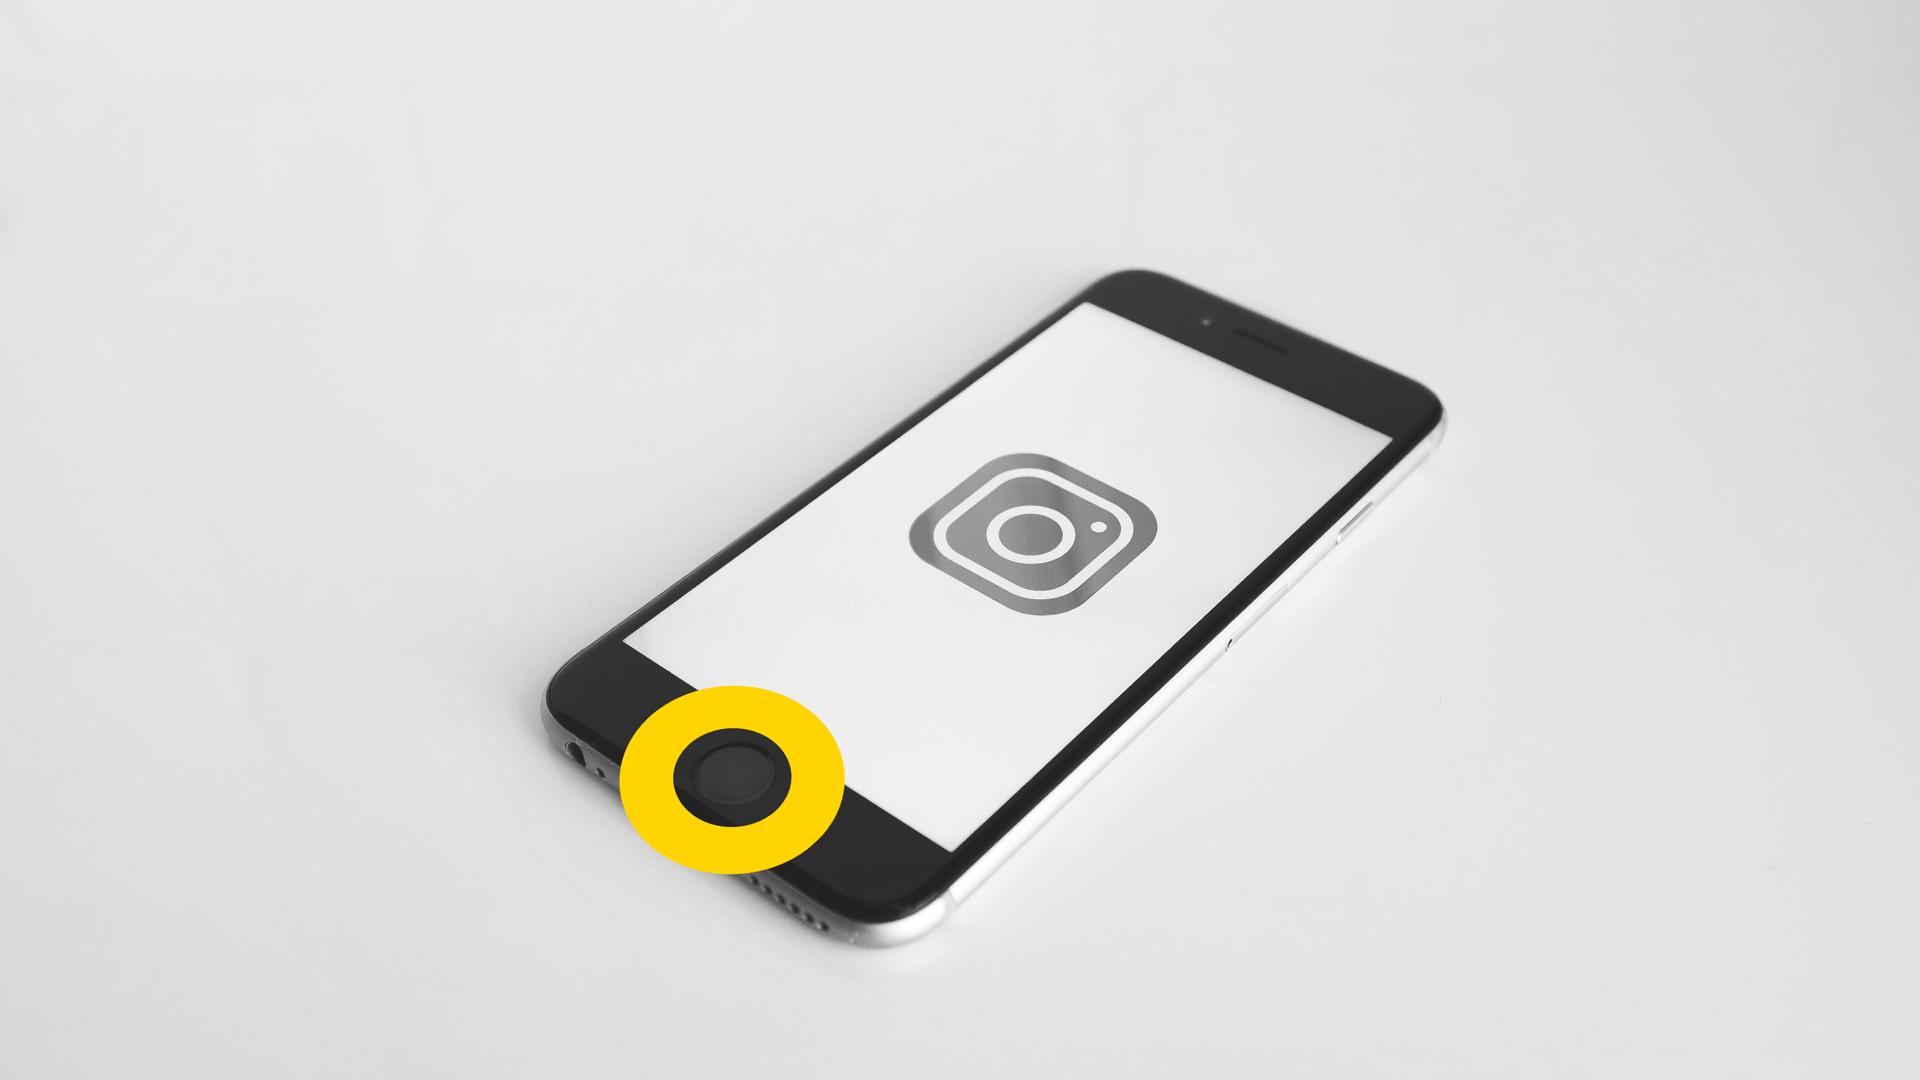 Dimensioni-social-network-blog-article-cover